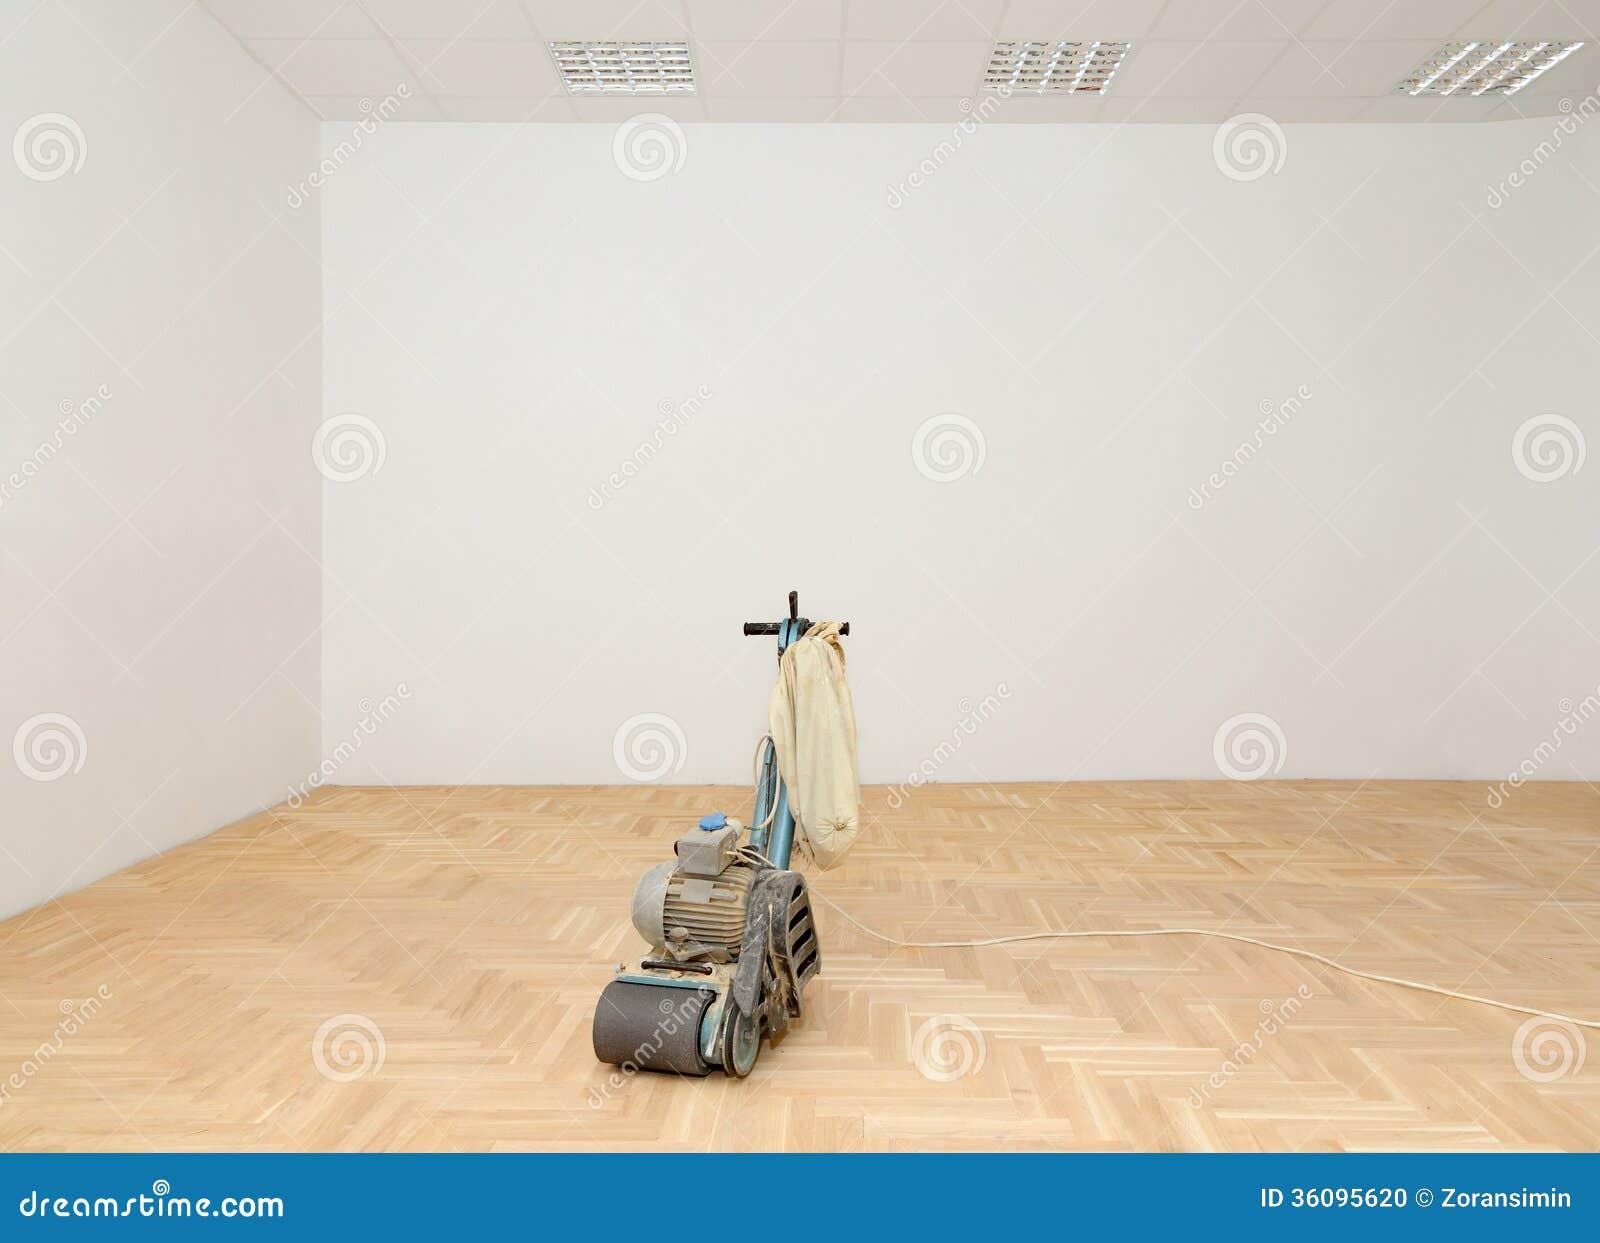 Home Renovation Stock Photo Image 36095620